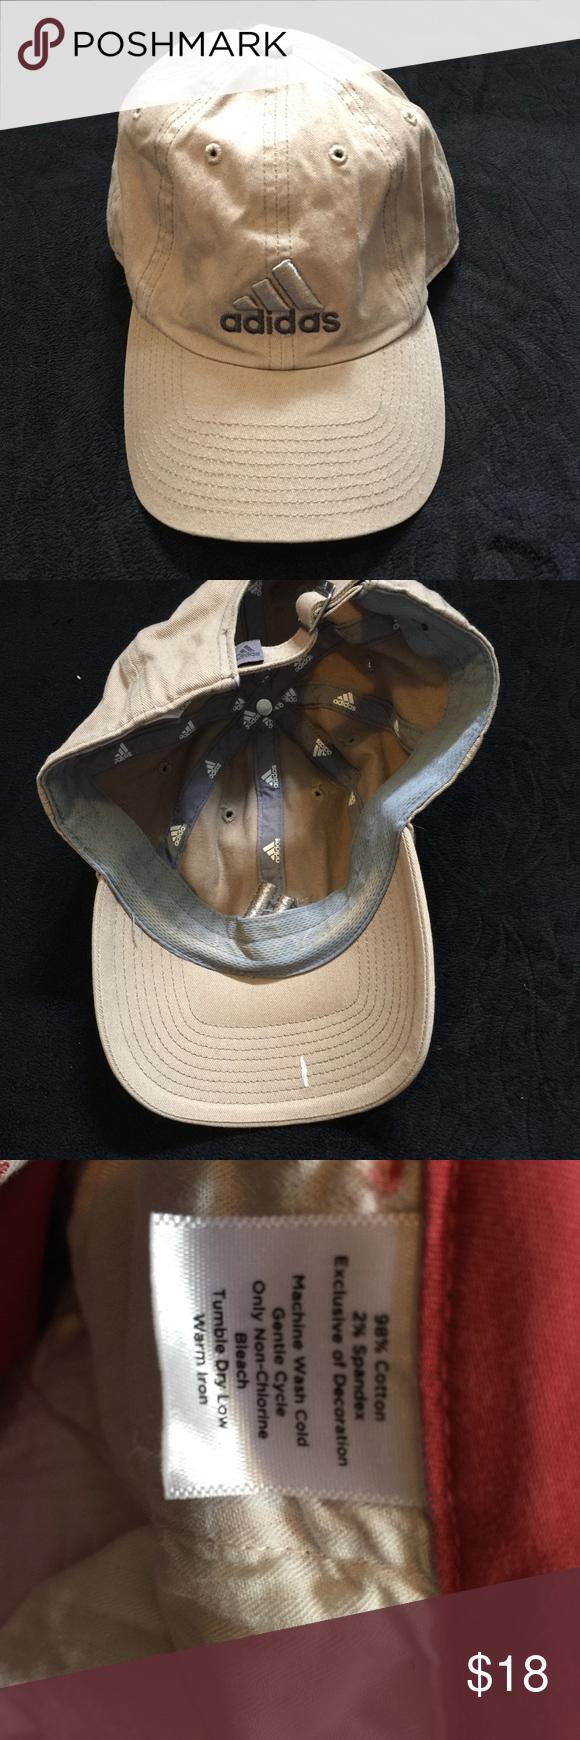 27179def4b9 Adidas hat cream adjustable one size os